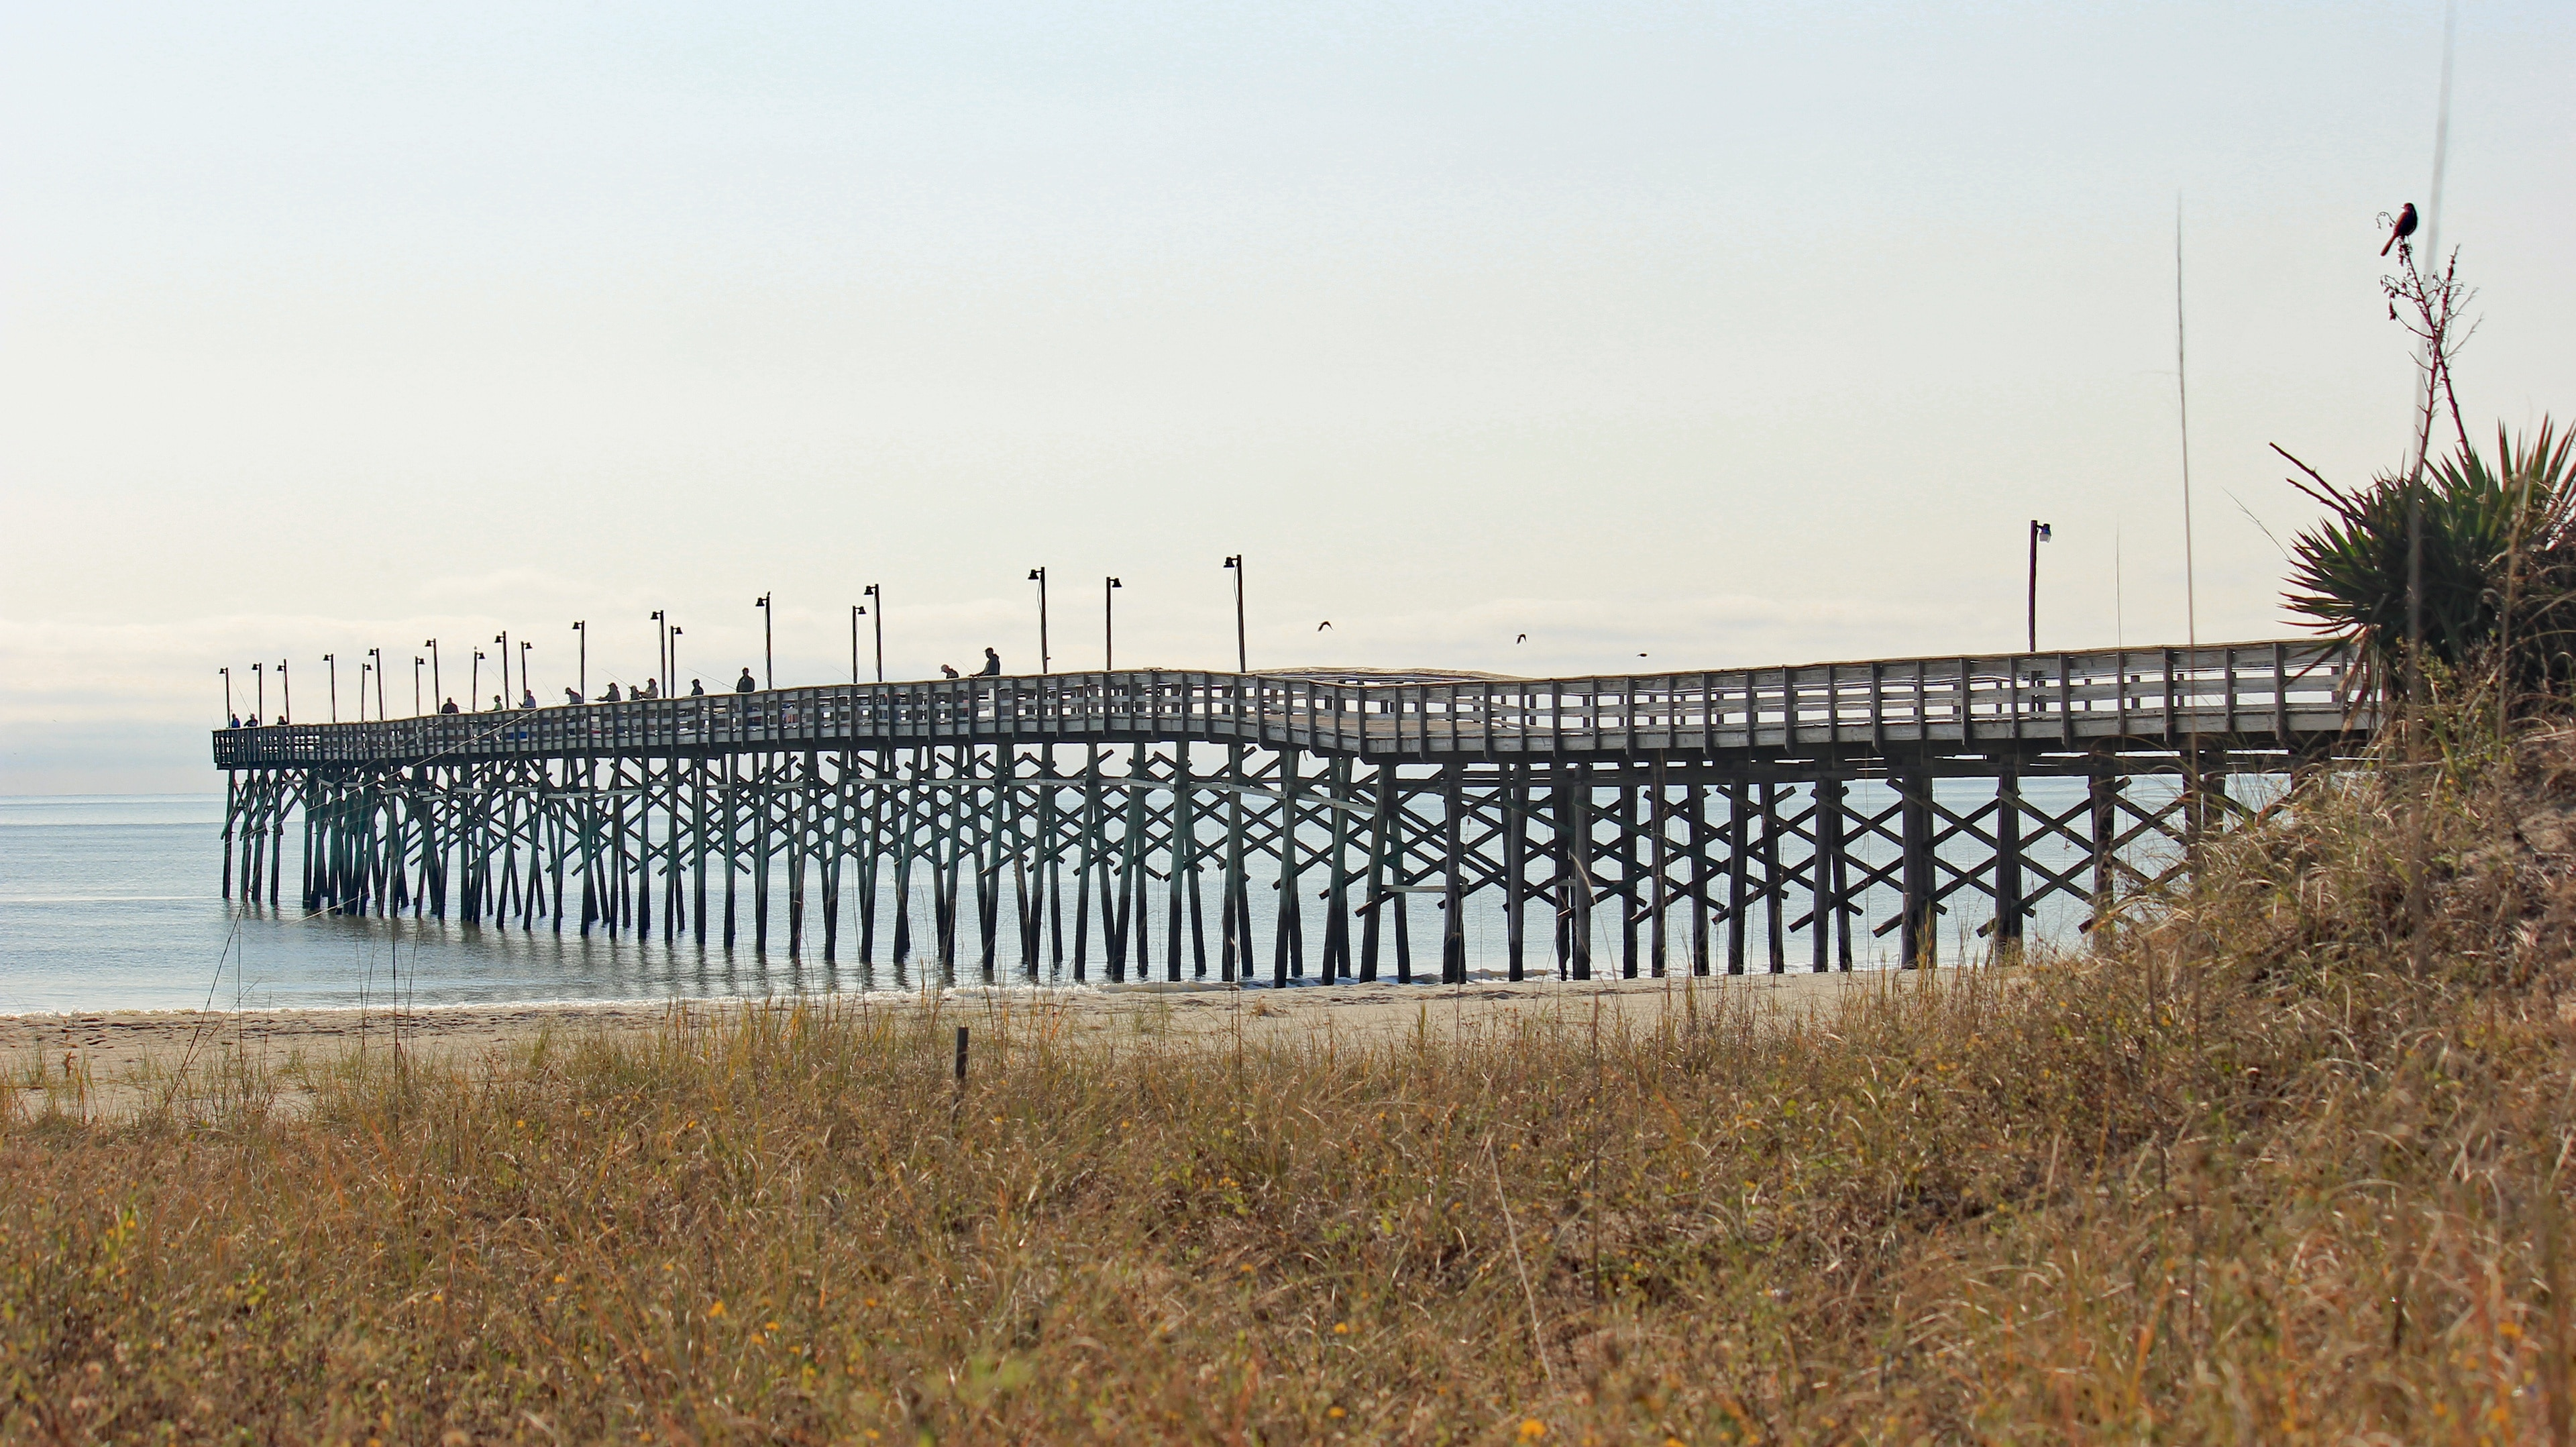 Carolina Beach, North Carolina, United States of America